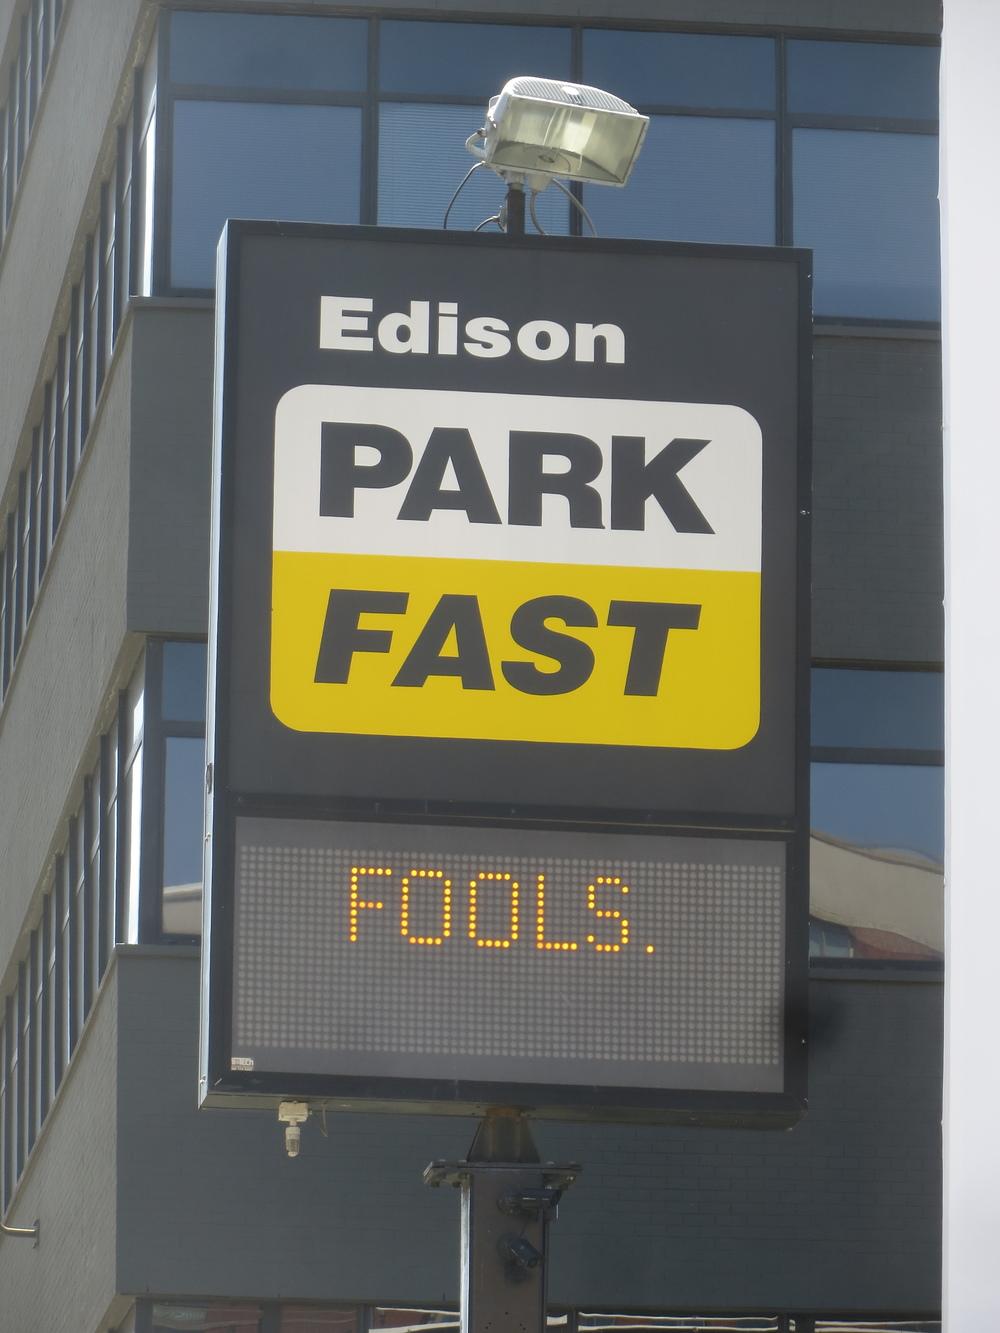 Park fast, fools.